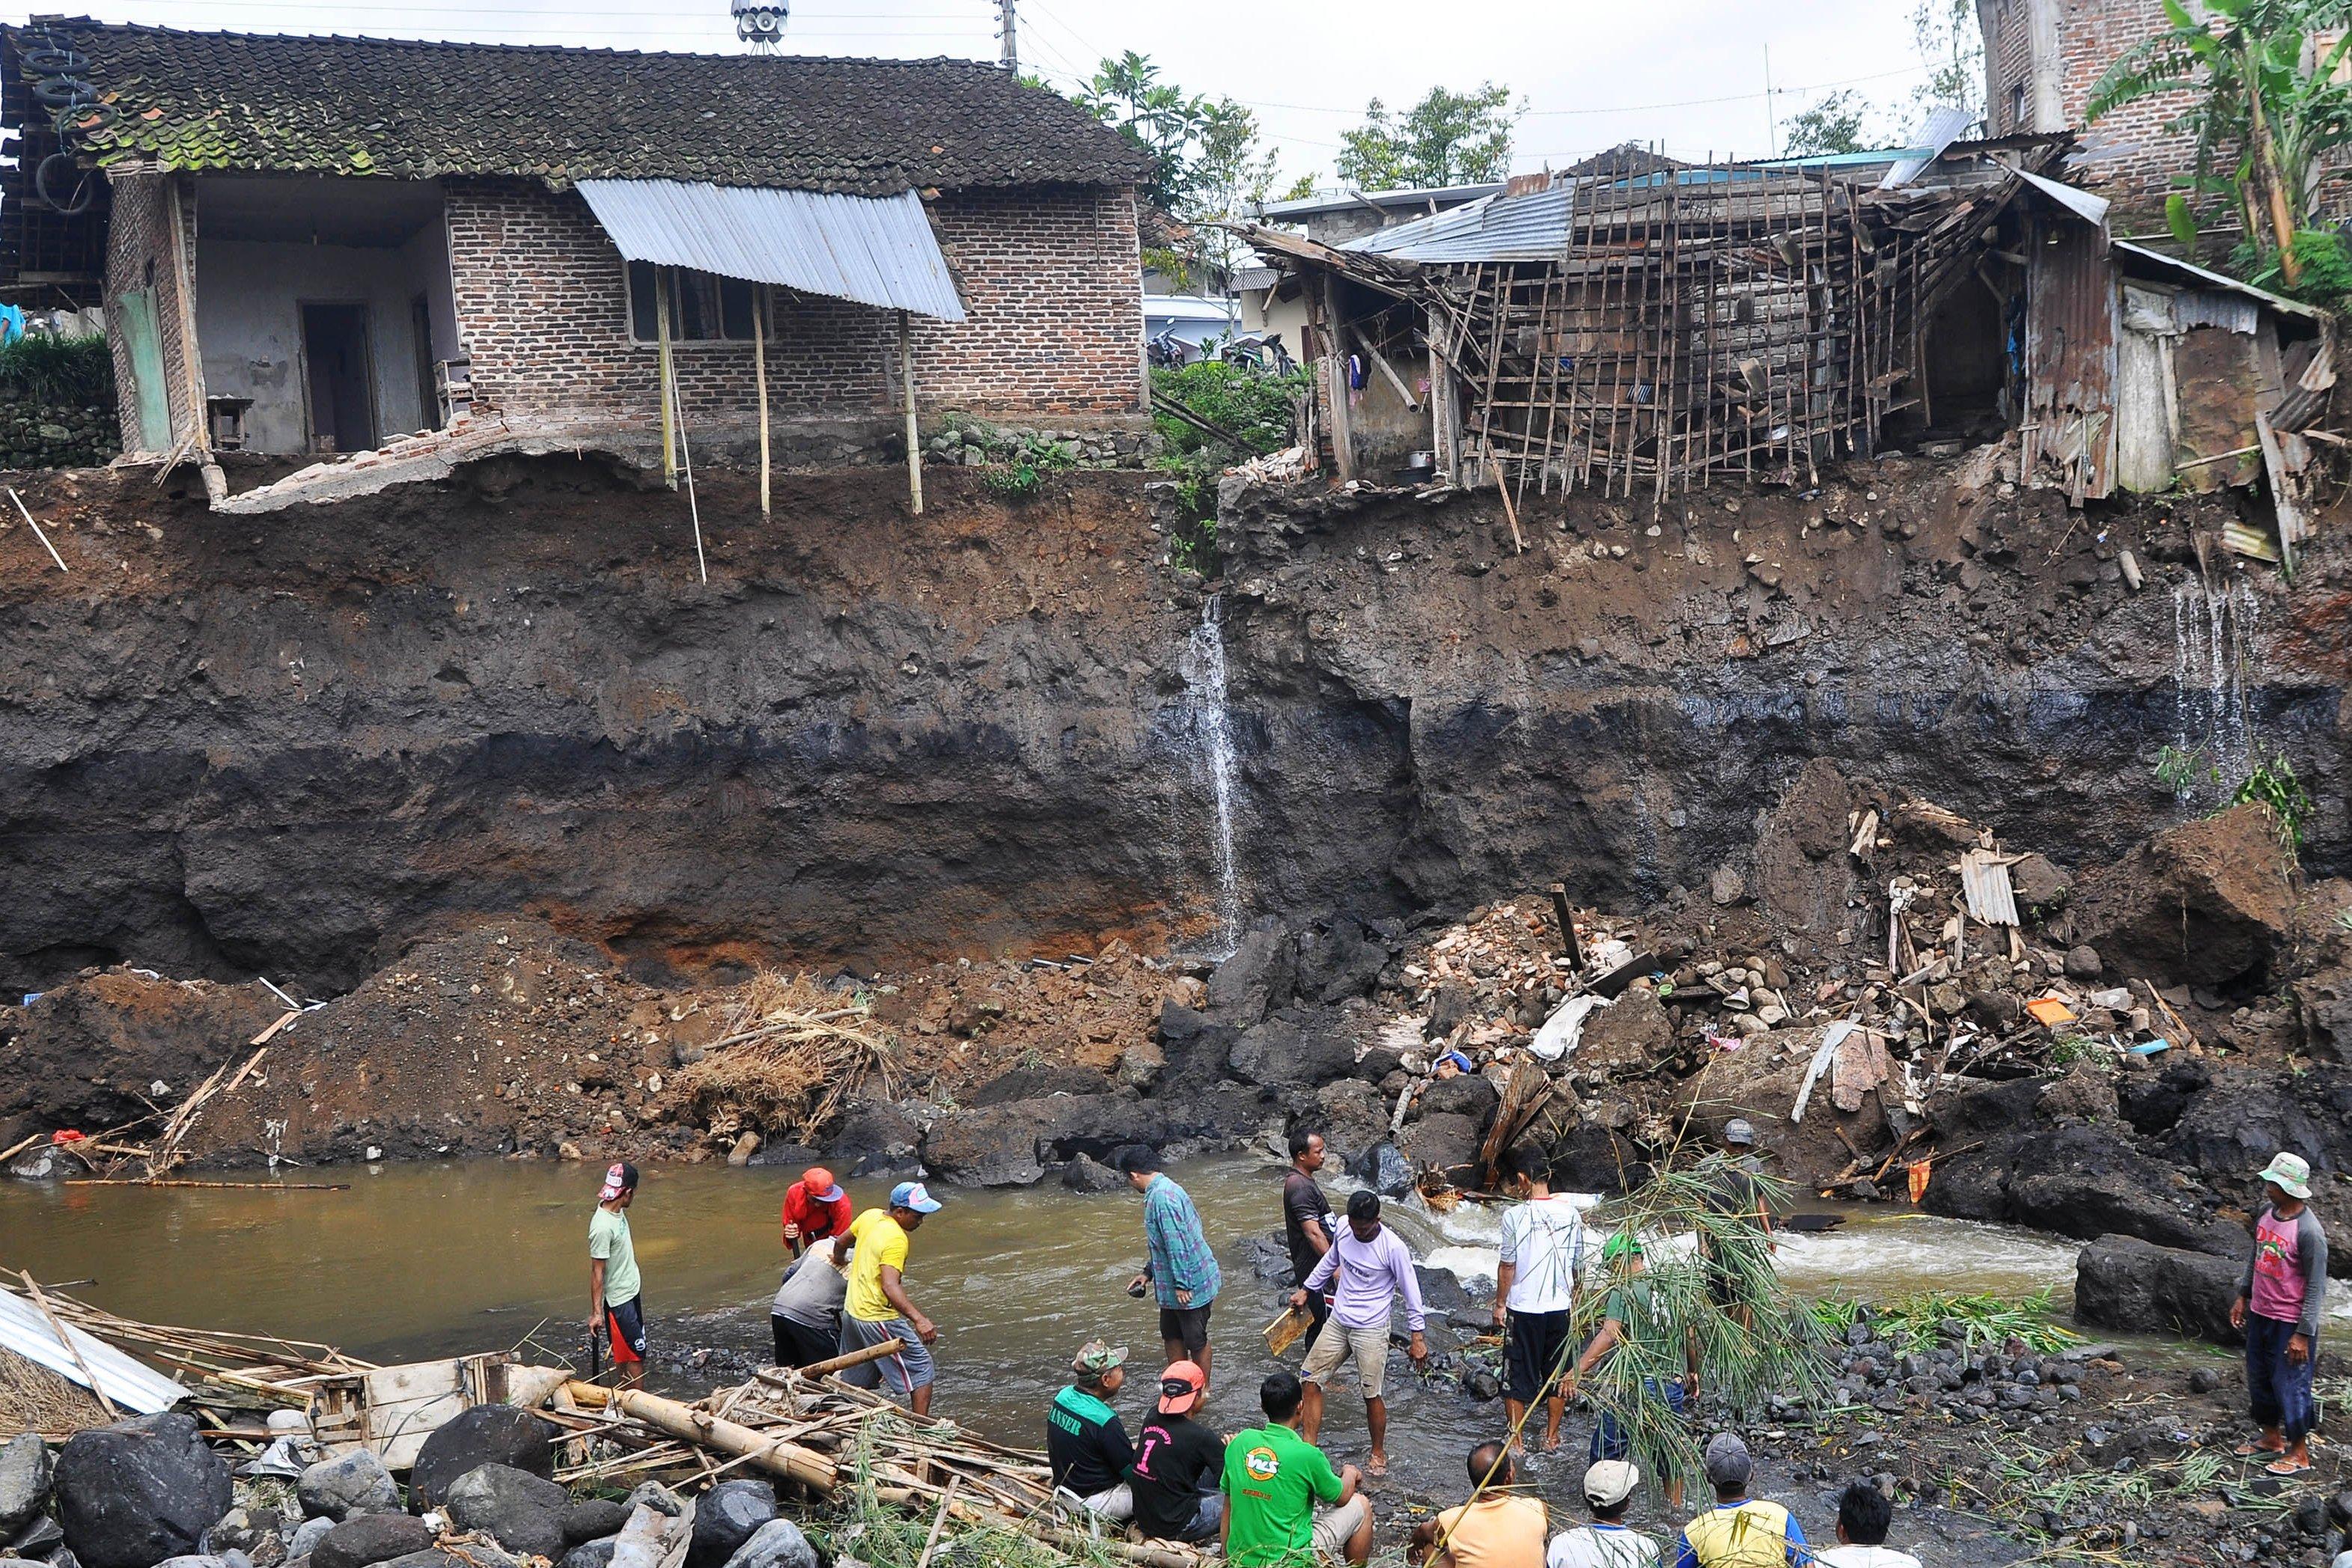 Hujan deras sepanjang hari Minggu (19/2) mengakibatkan sungai Brangkongan di Desa Ringinanom, Parakan, Temanggung, Jawa Tengah, meluap menyebabkan sedikitnya enam rumah di bibir sungai roboh dan 25 ekor kambing hanyut.